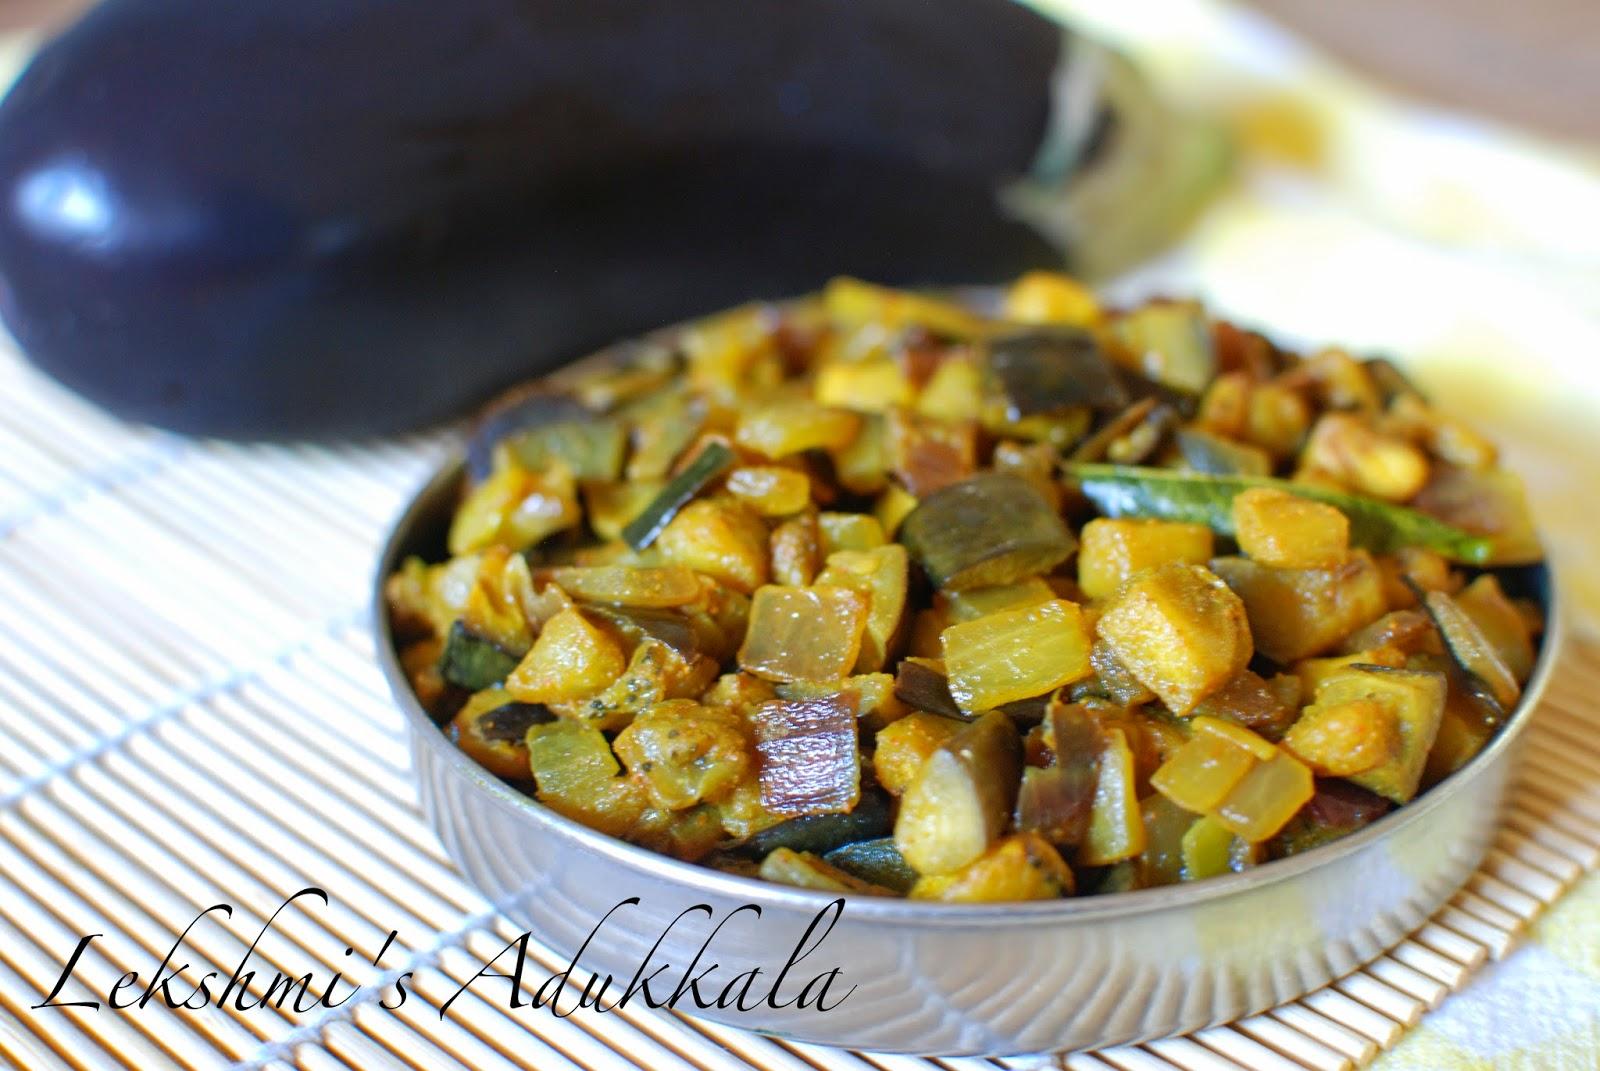 Lekshmi's Adukkala: Vazhuthananga Mezhukkupuratti / Brinjal Stir Fry